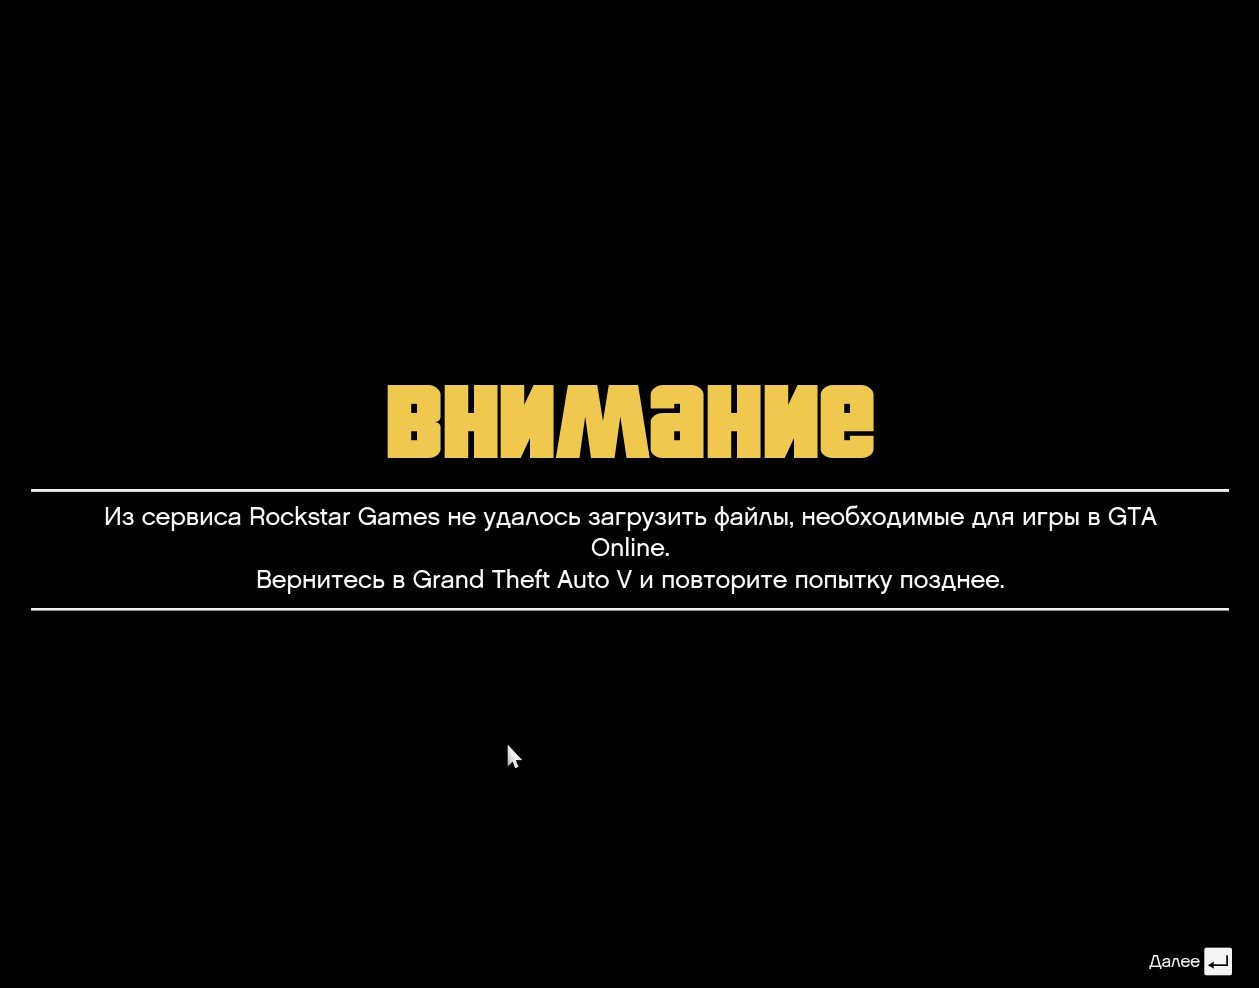 Rockstar Games не удалось загрузить файлы